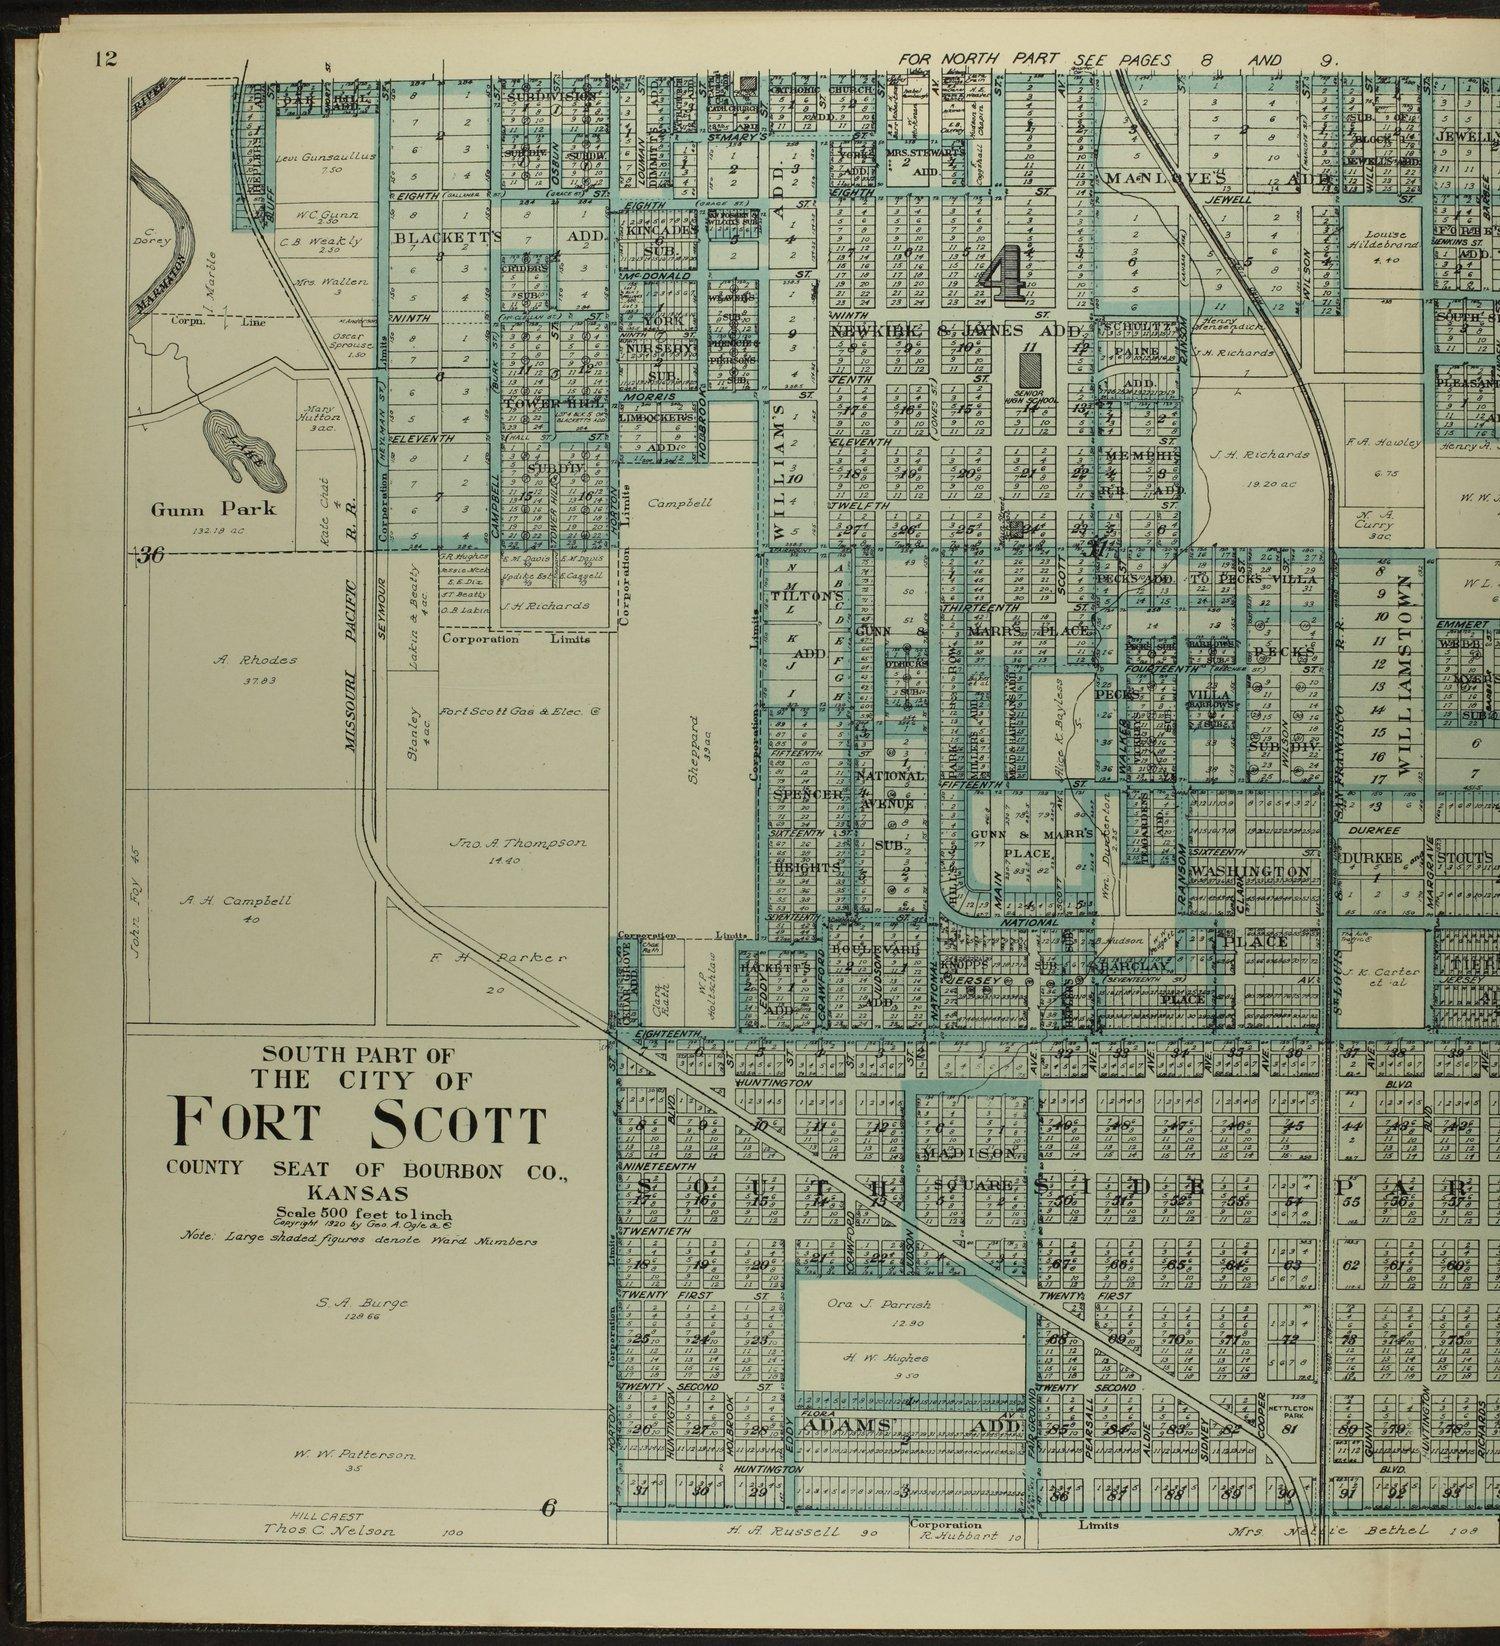 Standard atlas of Bourbon County, Kansas - 12